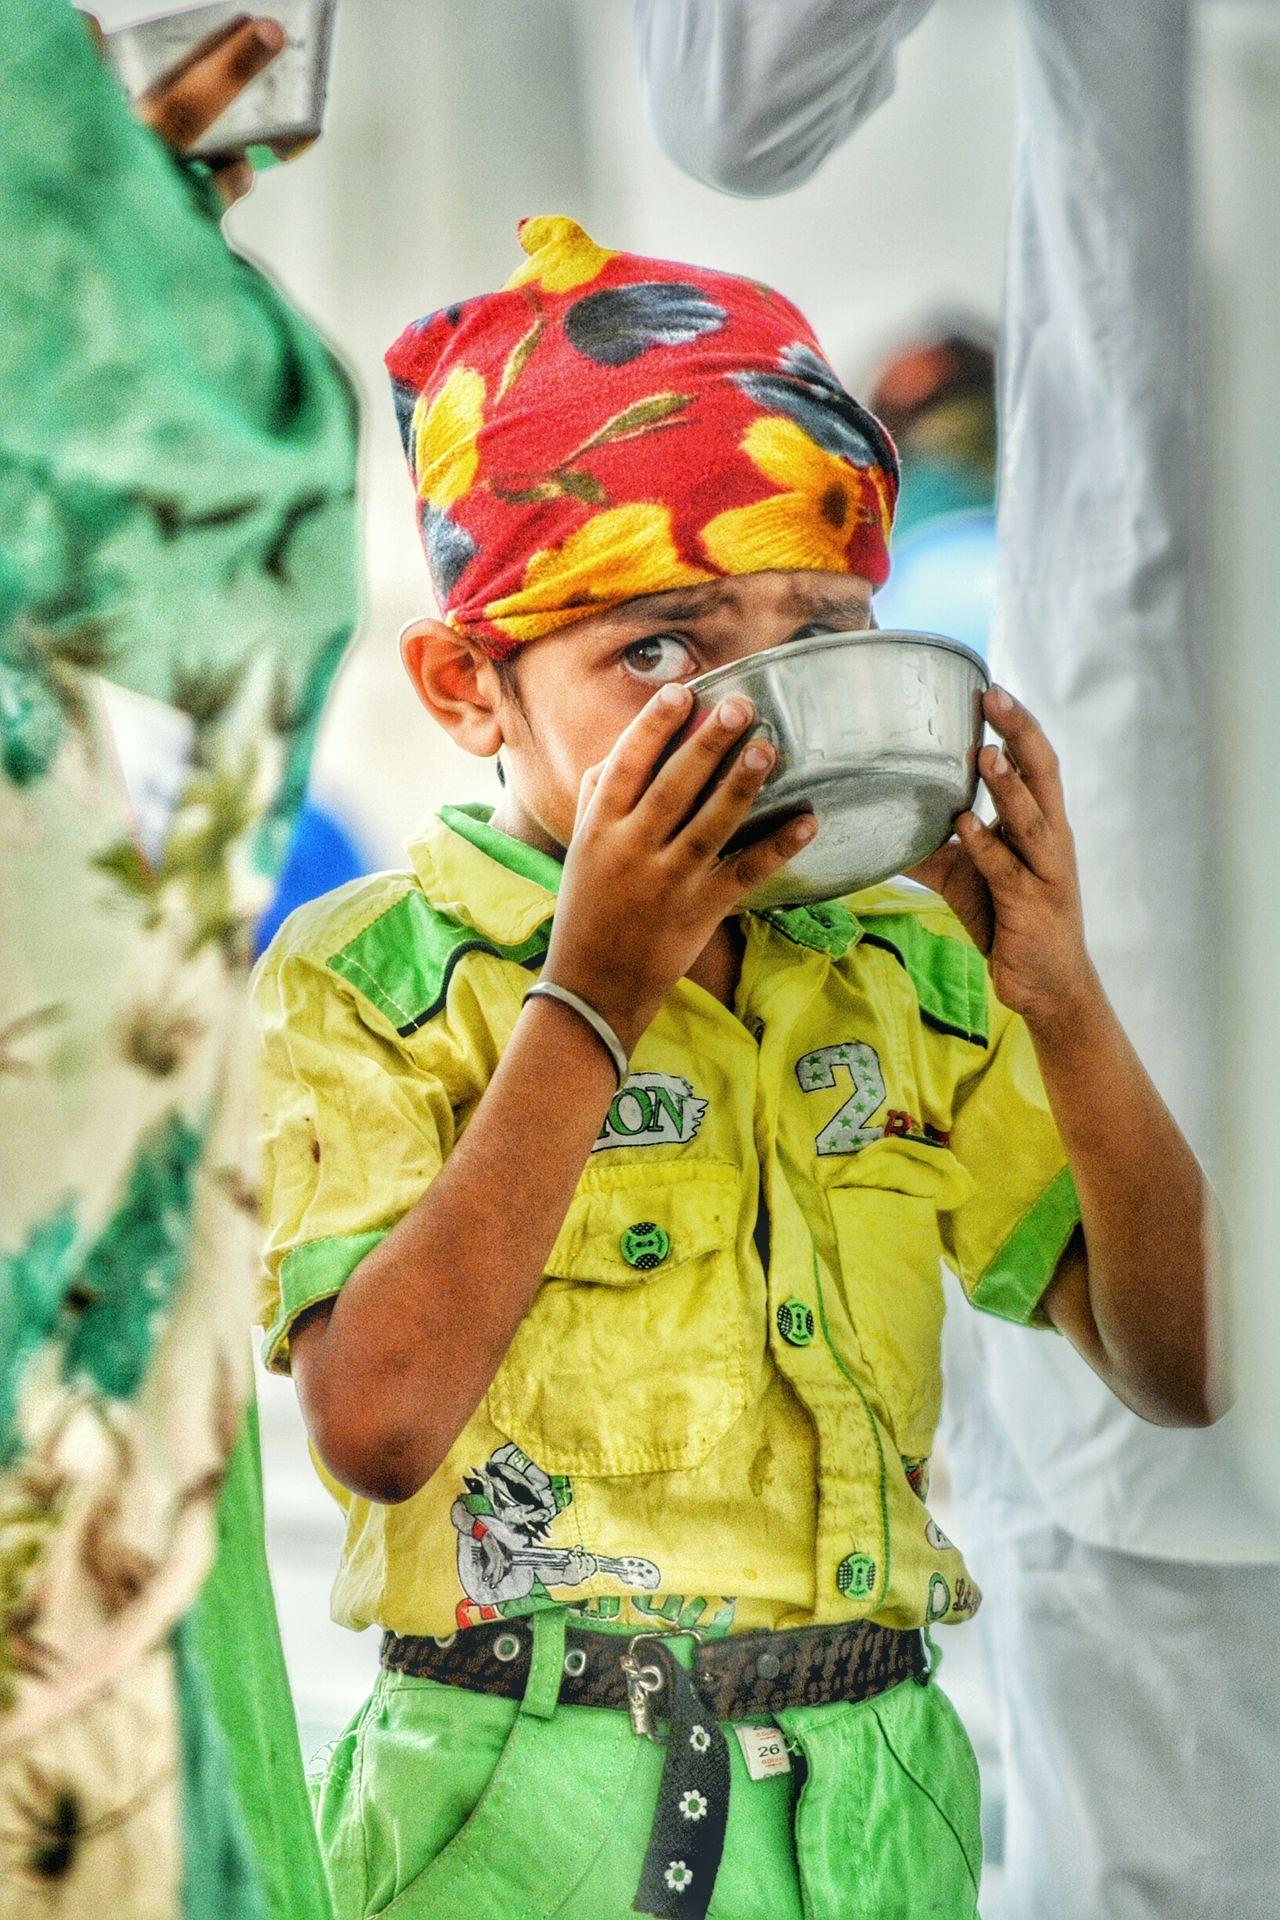 Seeking Drinkingwater Colourful Child Golden Temple EyeEm Best Shots Eyeemphotography Live For The Story